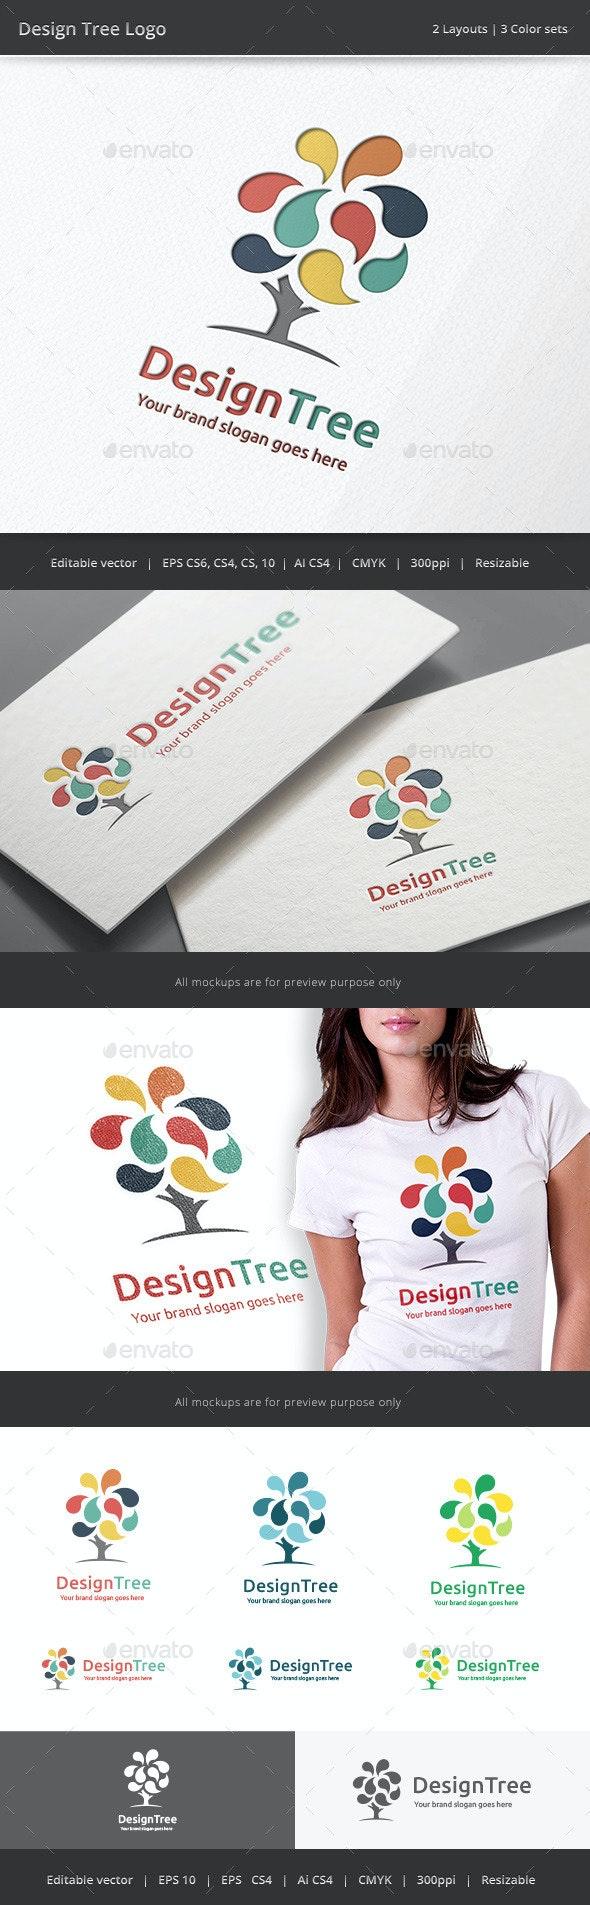 Design Tree Logo - Nature Logo Templates